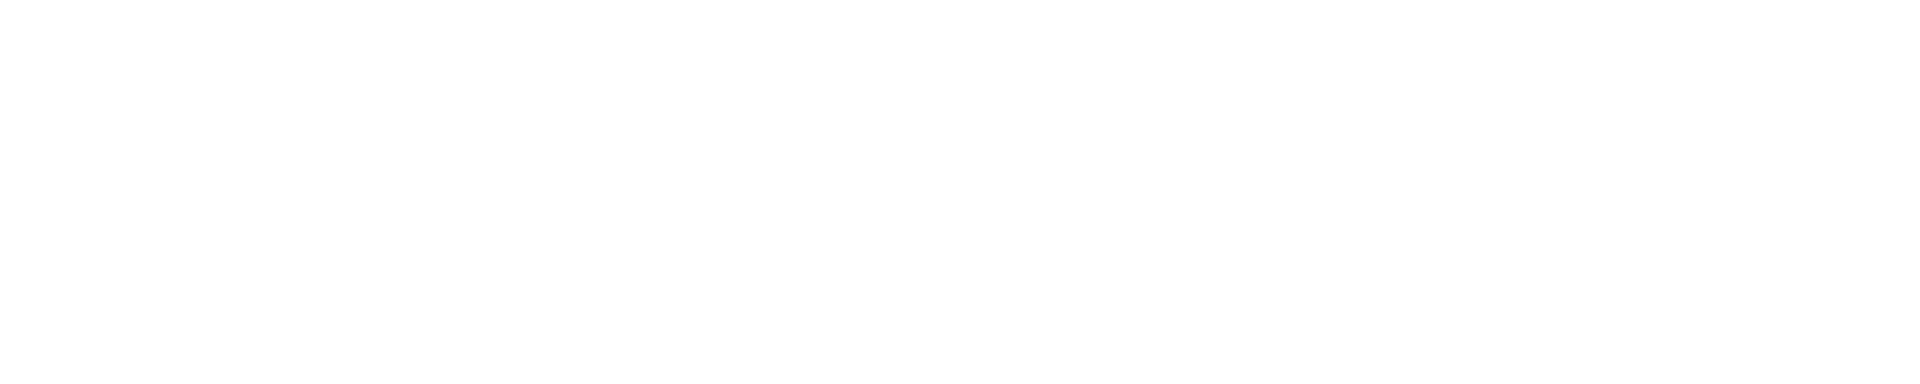 Capt'N Cook OvenPlus Salamander Grill Logo